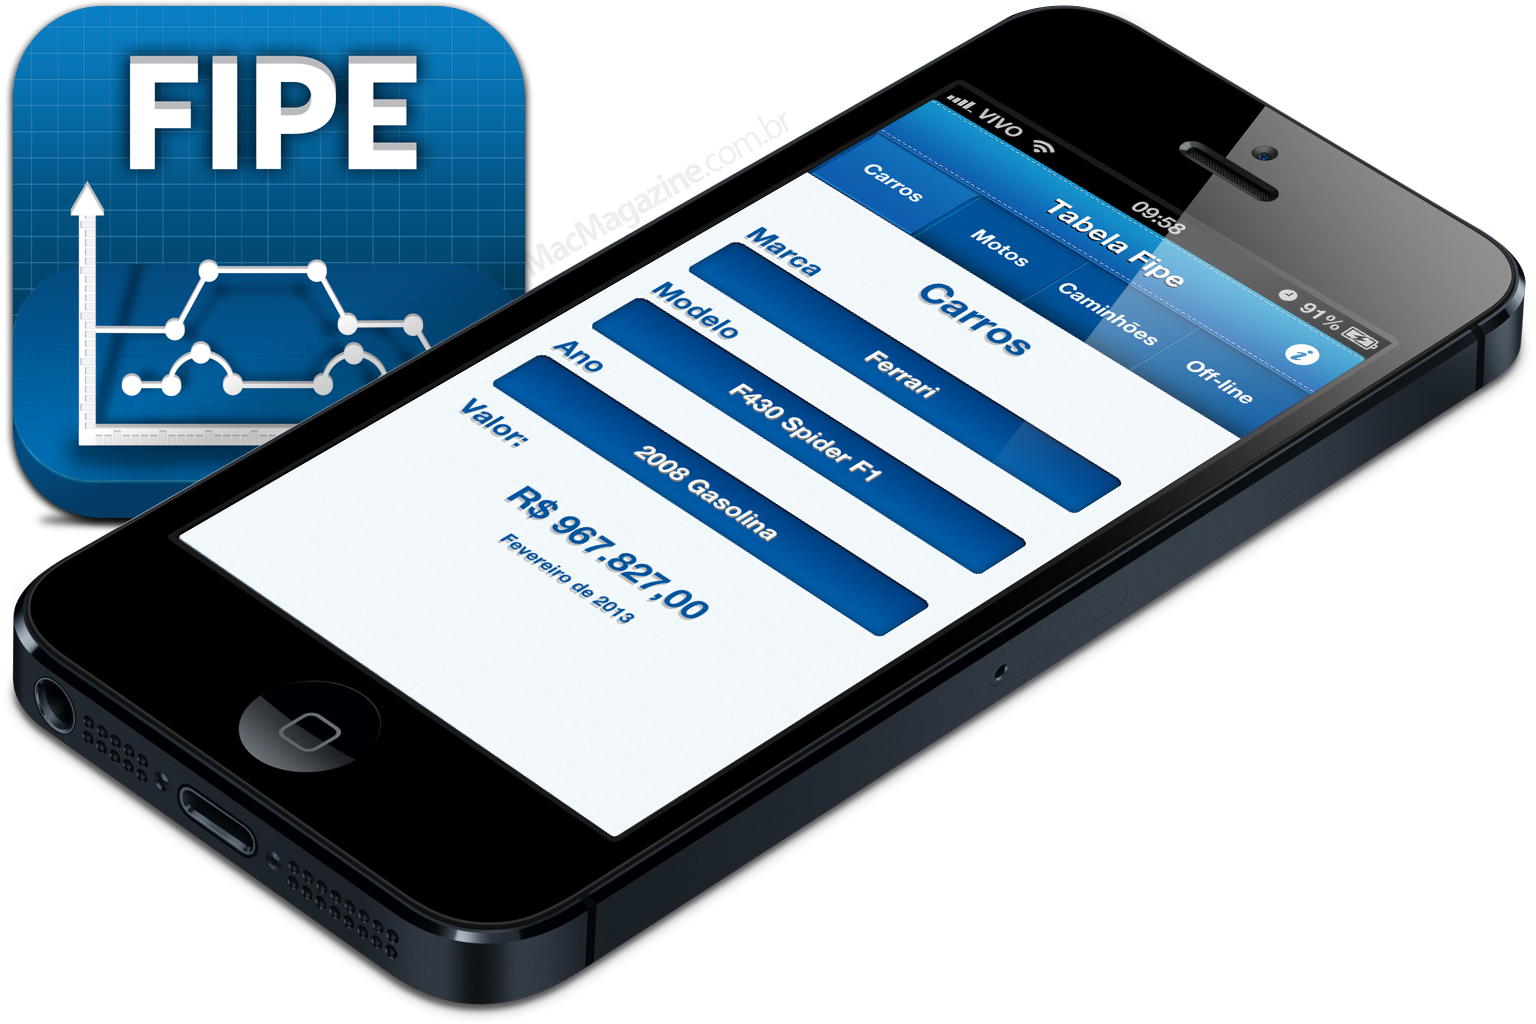 Tabela Fipe - iPhone